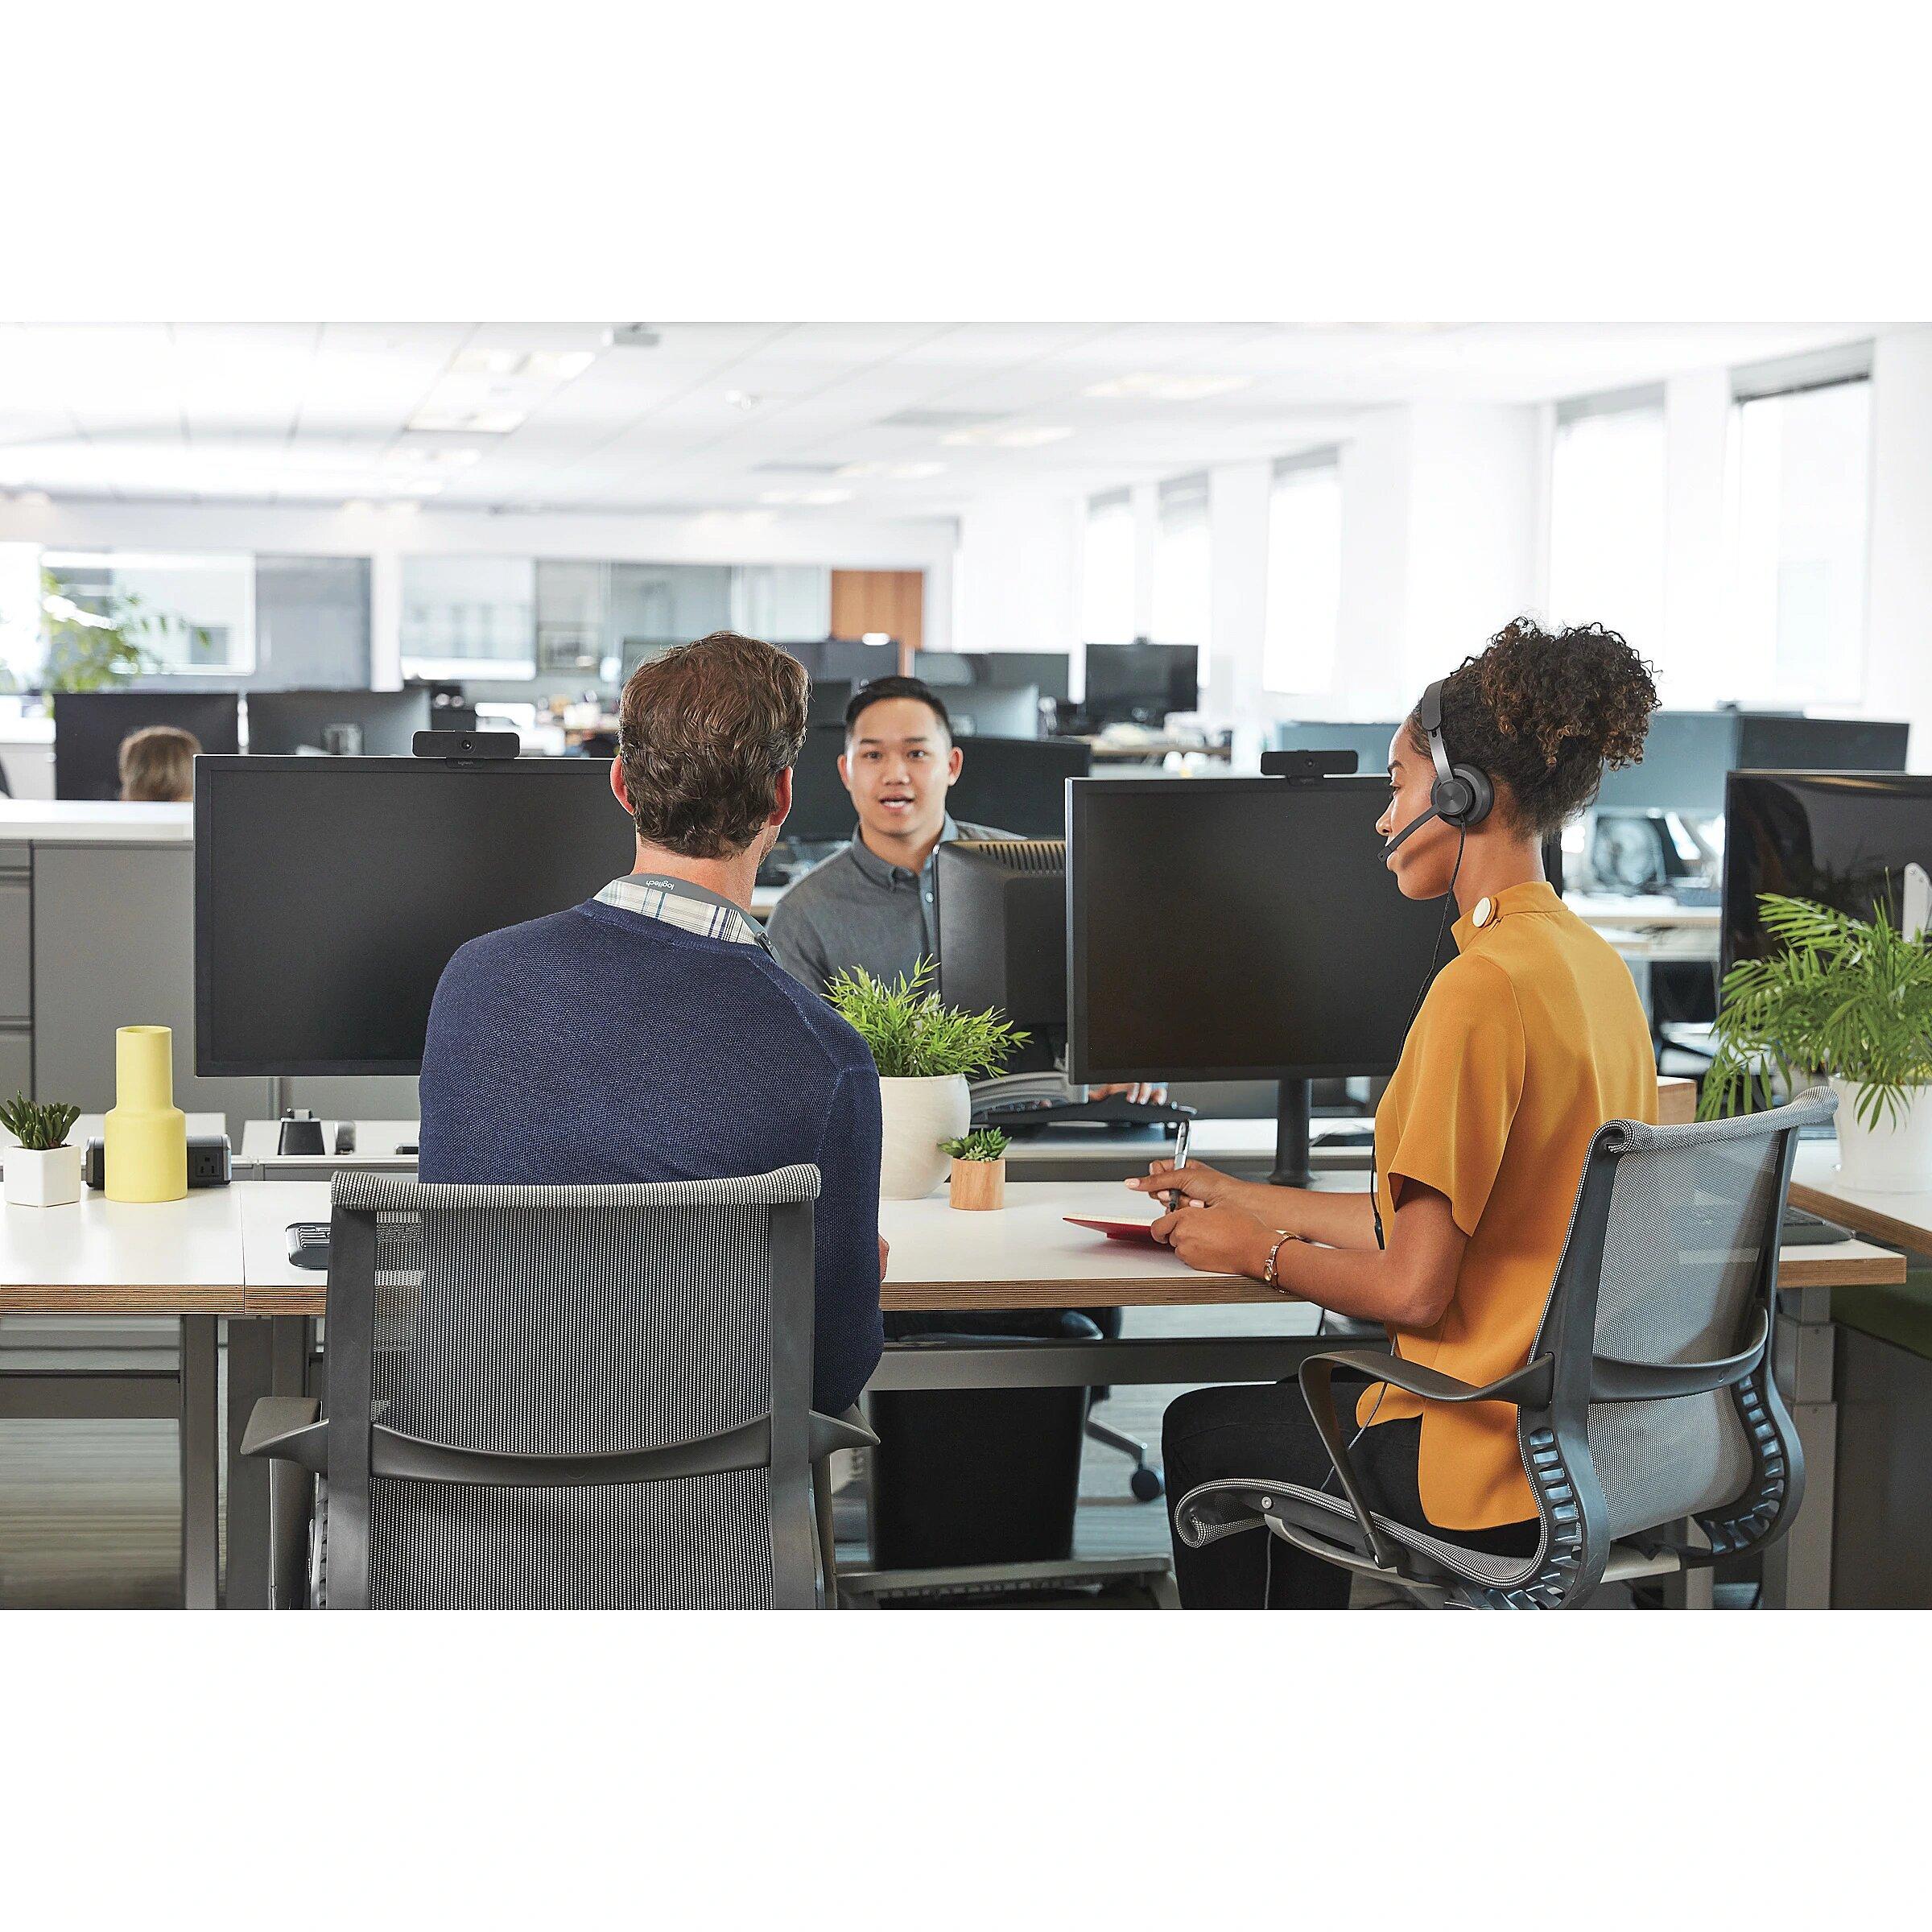 Logitech WIRED PERSONAL VC UC KIT GRAPHITE USB PLUGA EMEA UC (991-000339)